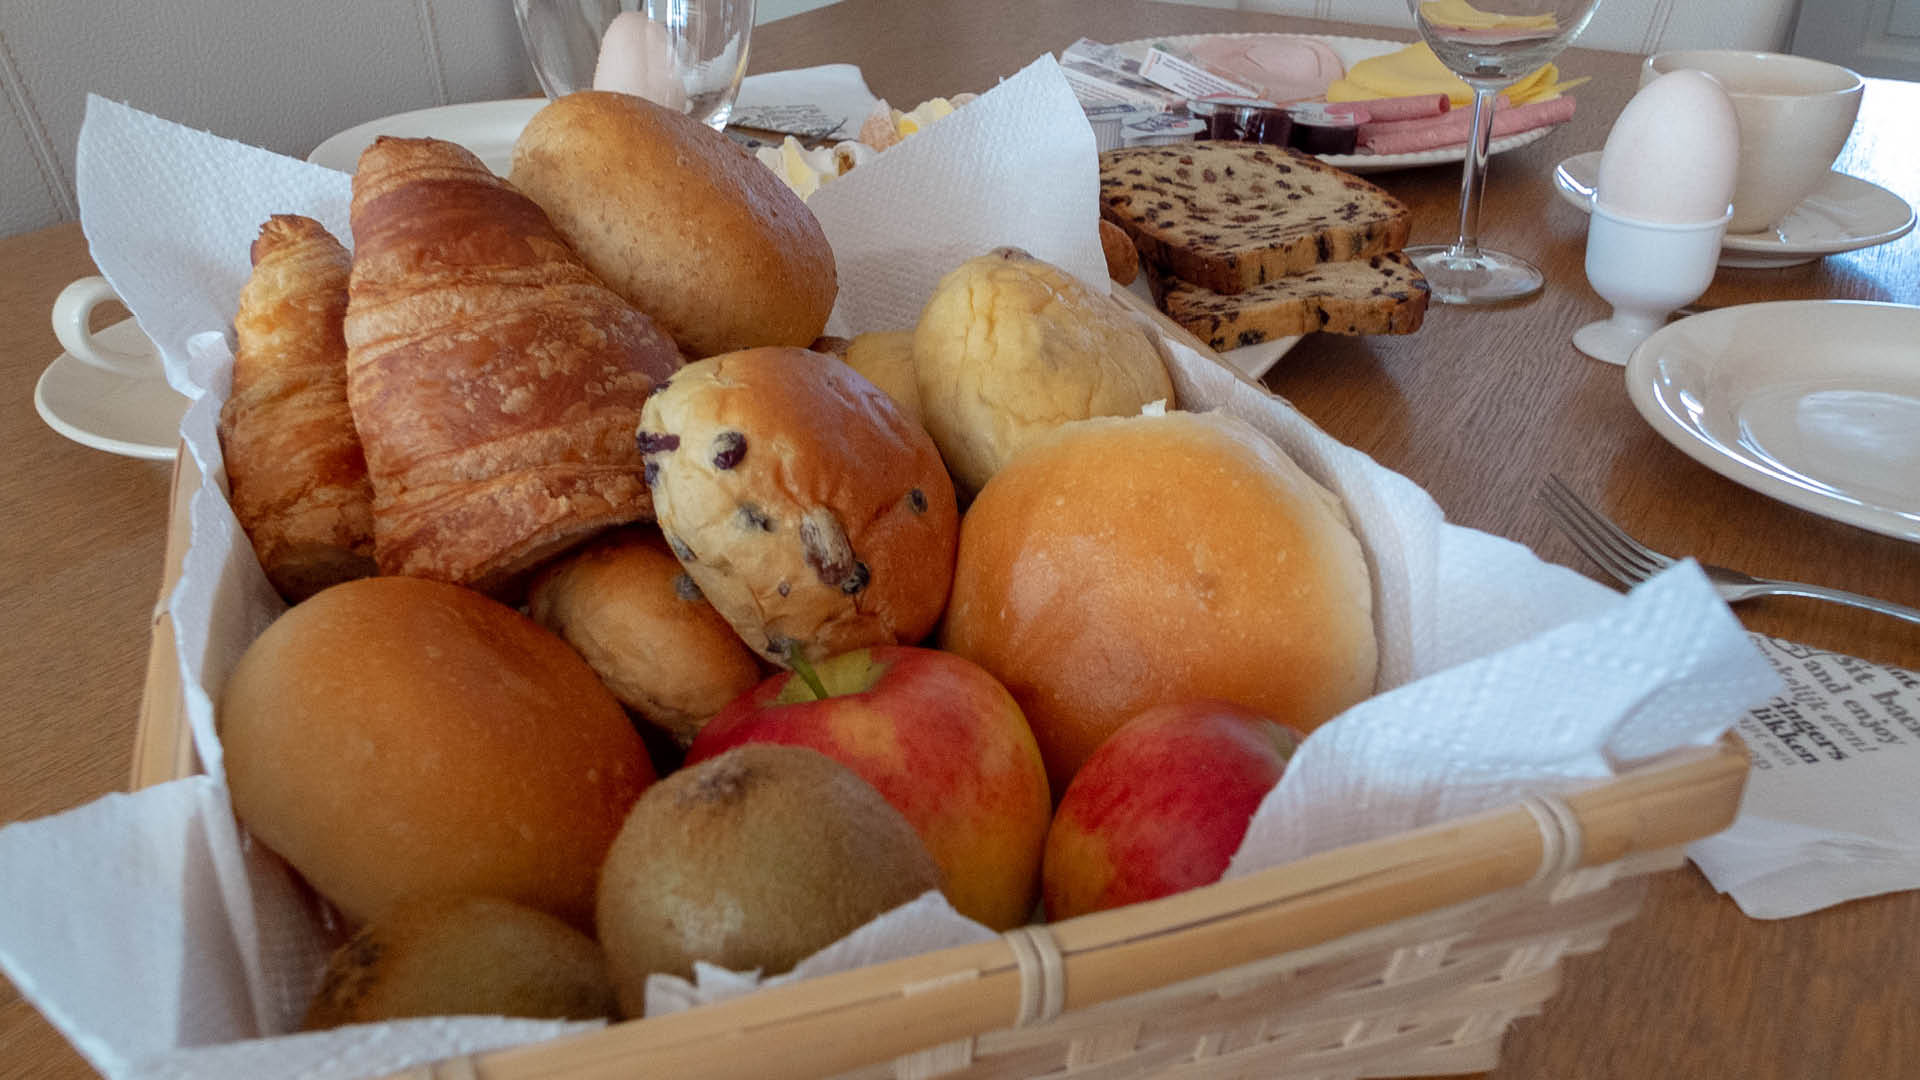 Slider ontbijtservice4